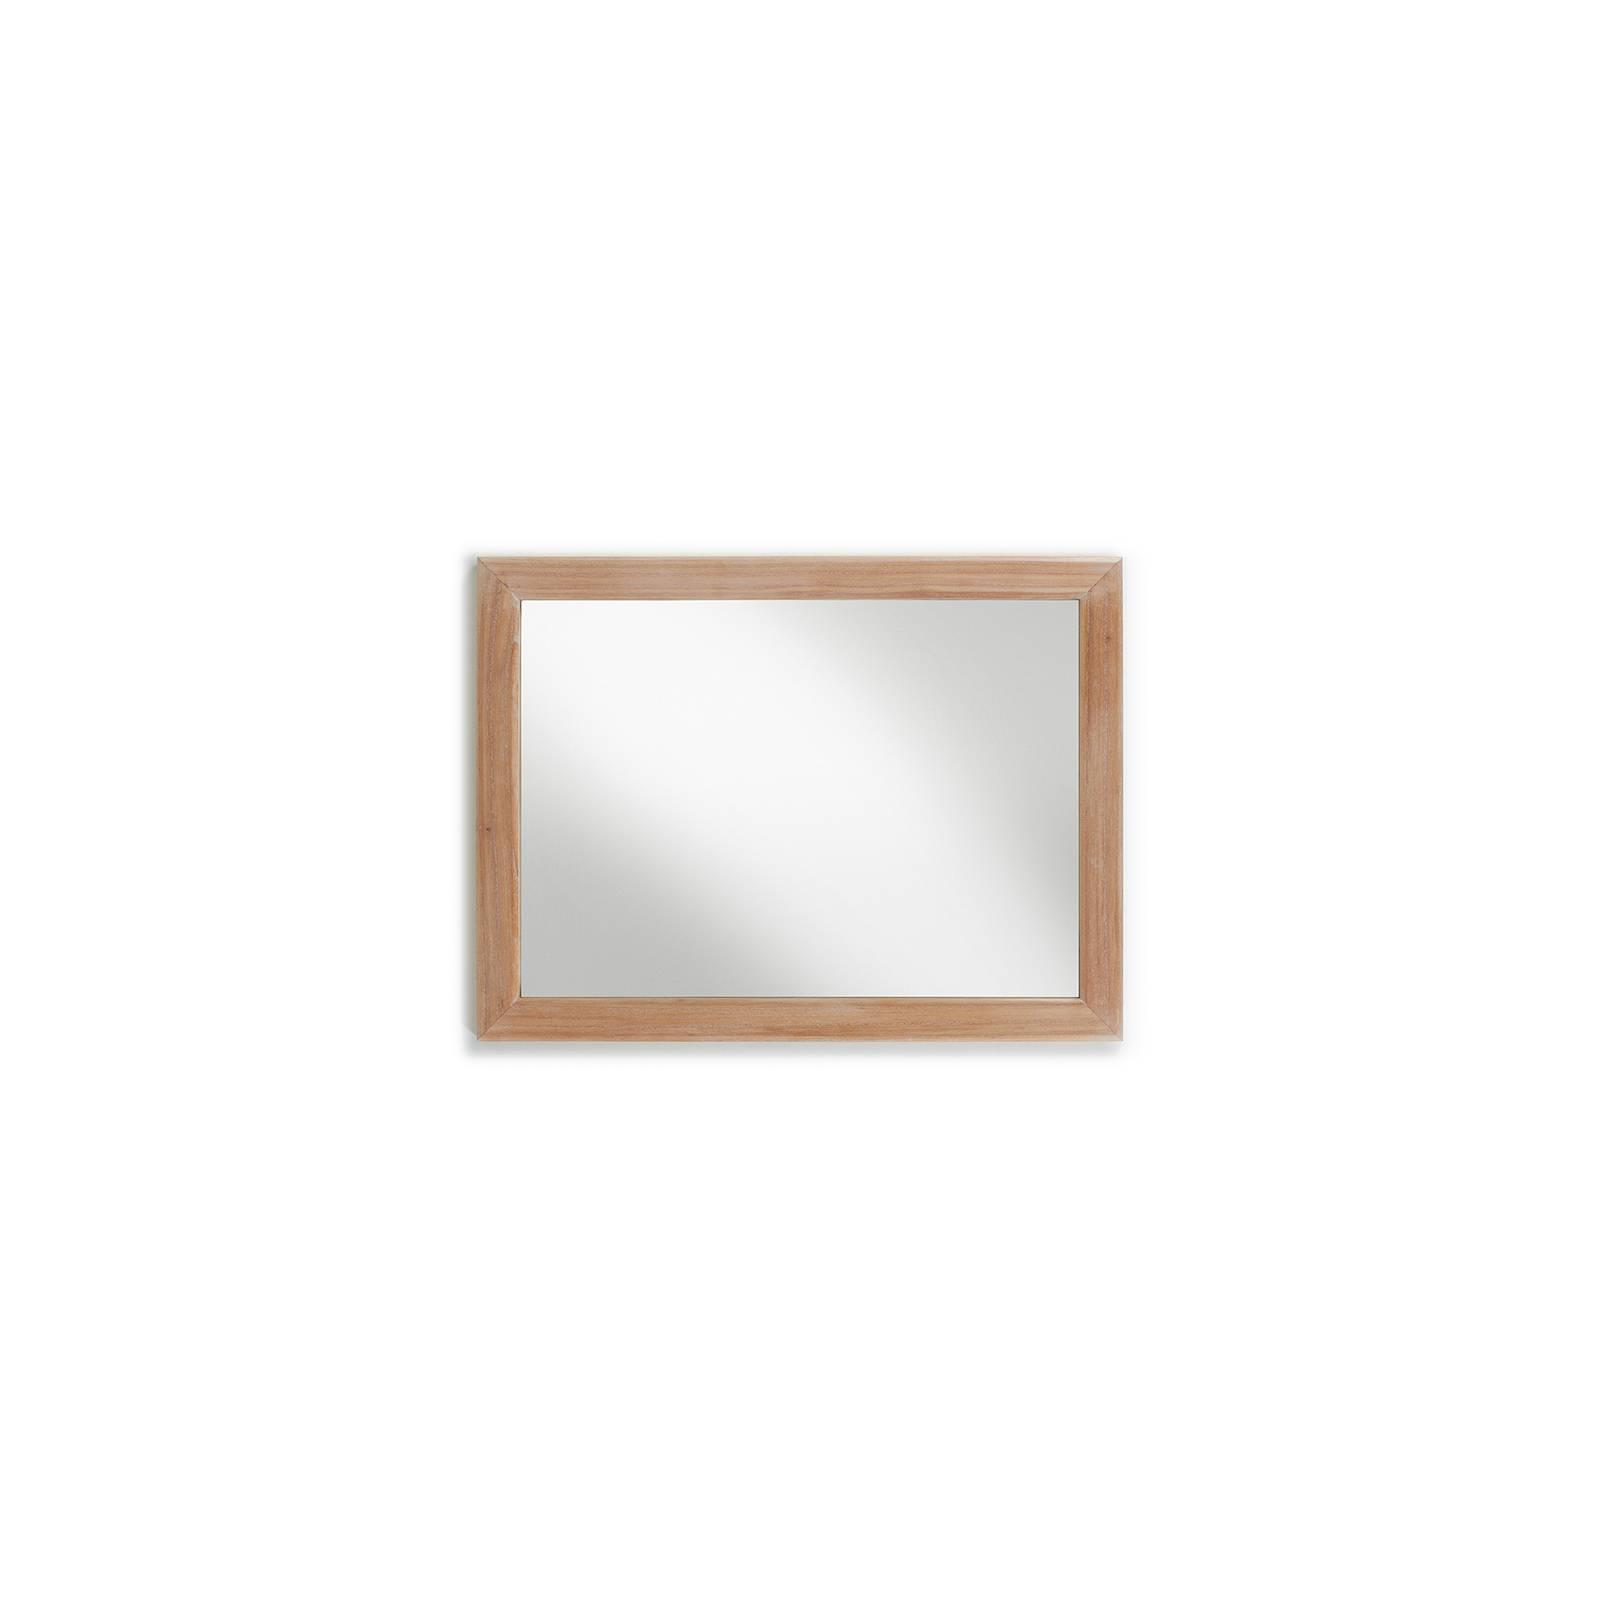 Miroir Rectangulaire PM Oslo Mindy - meubles scandinaves